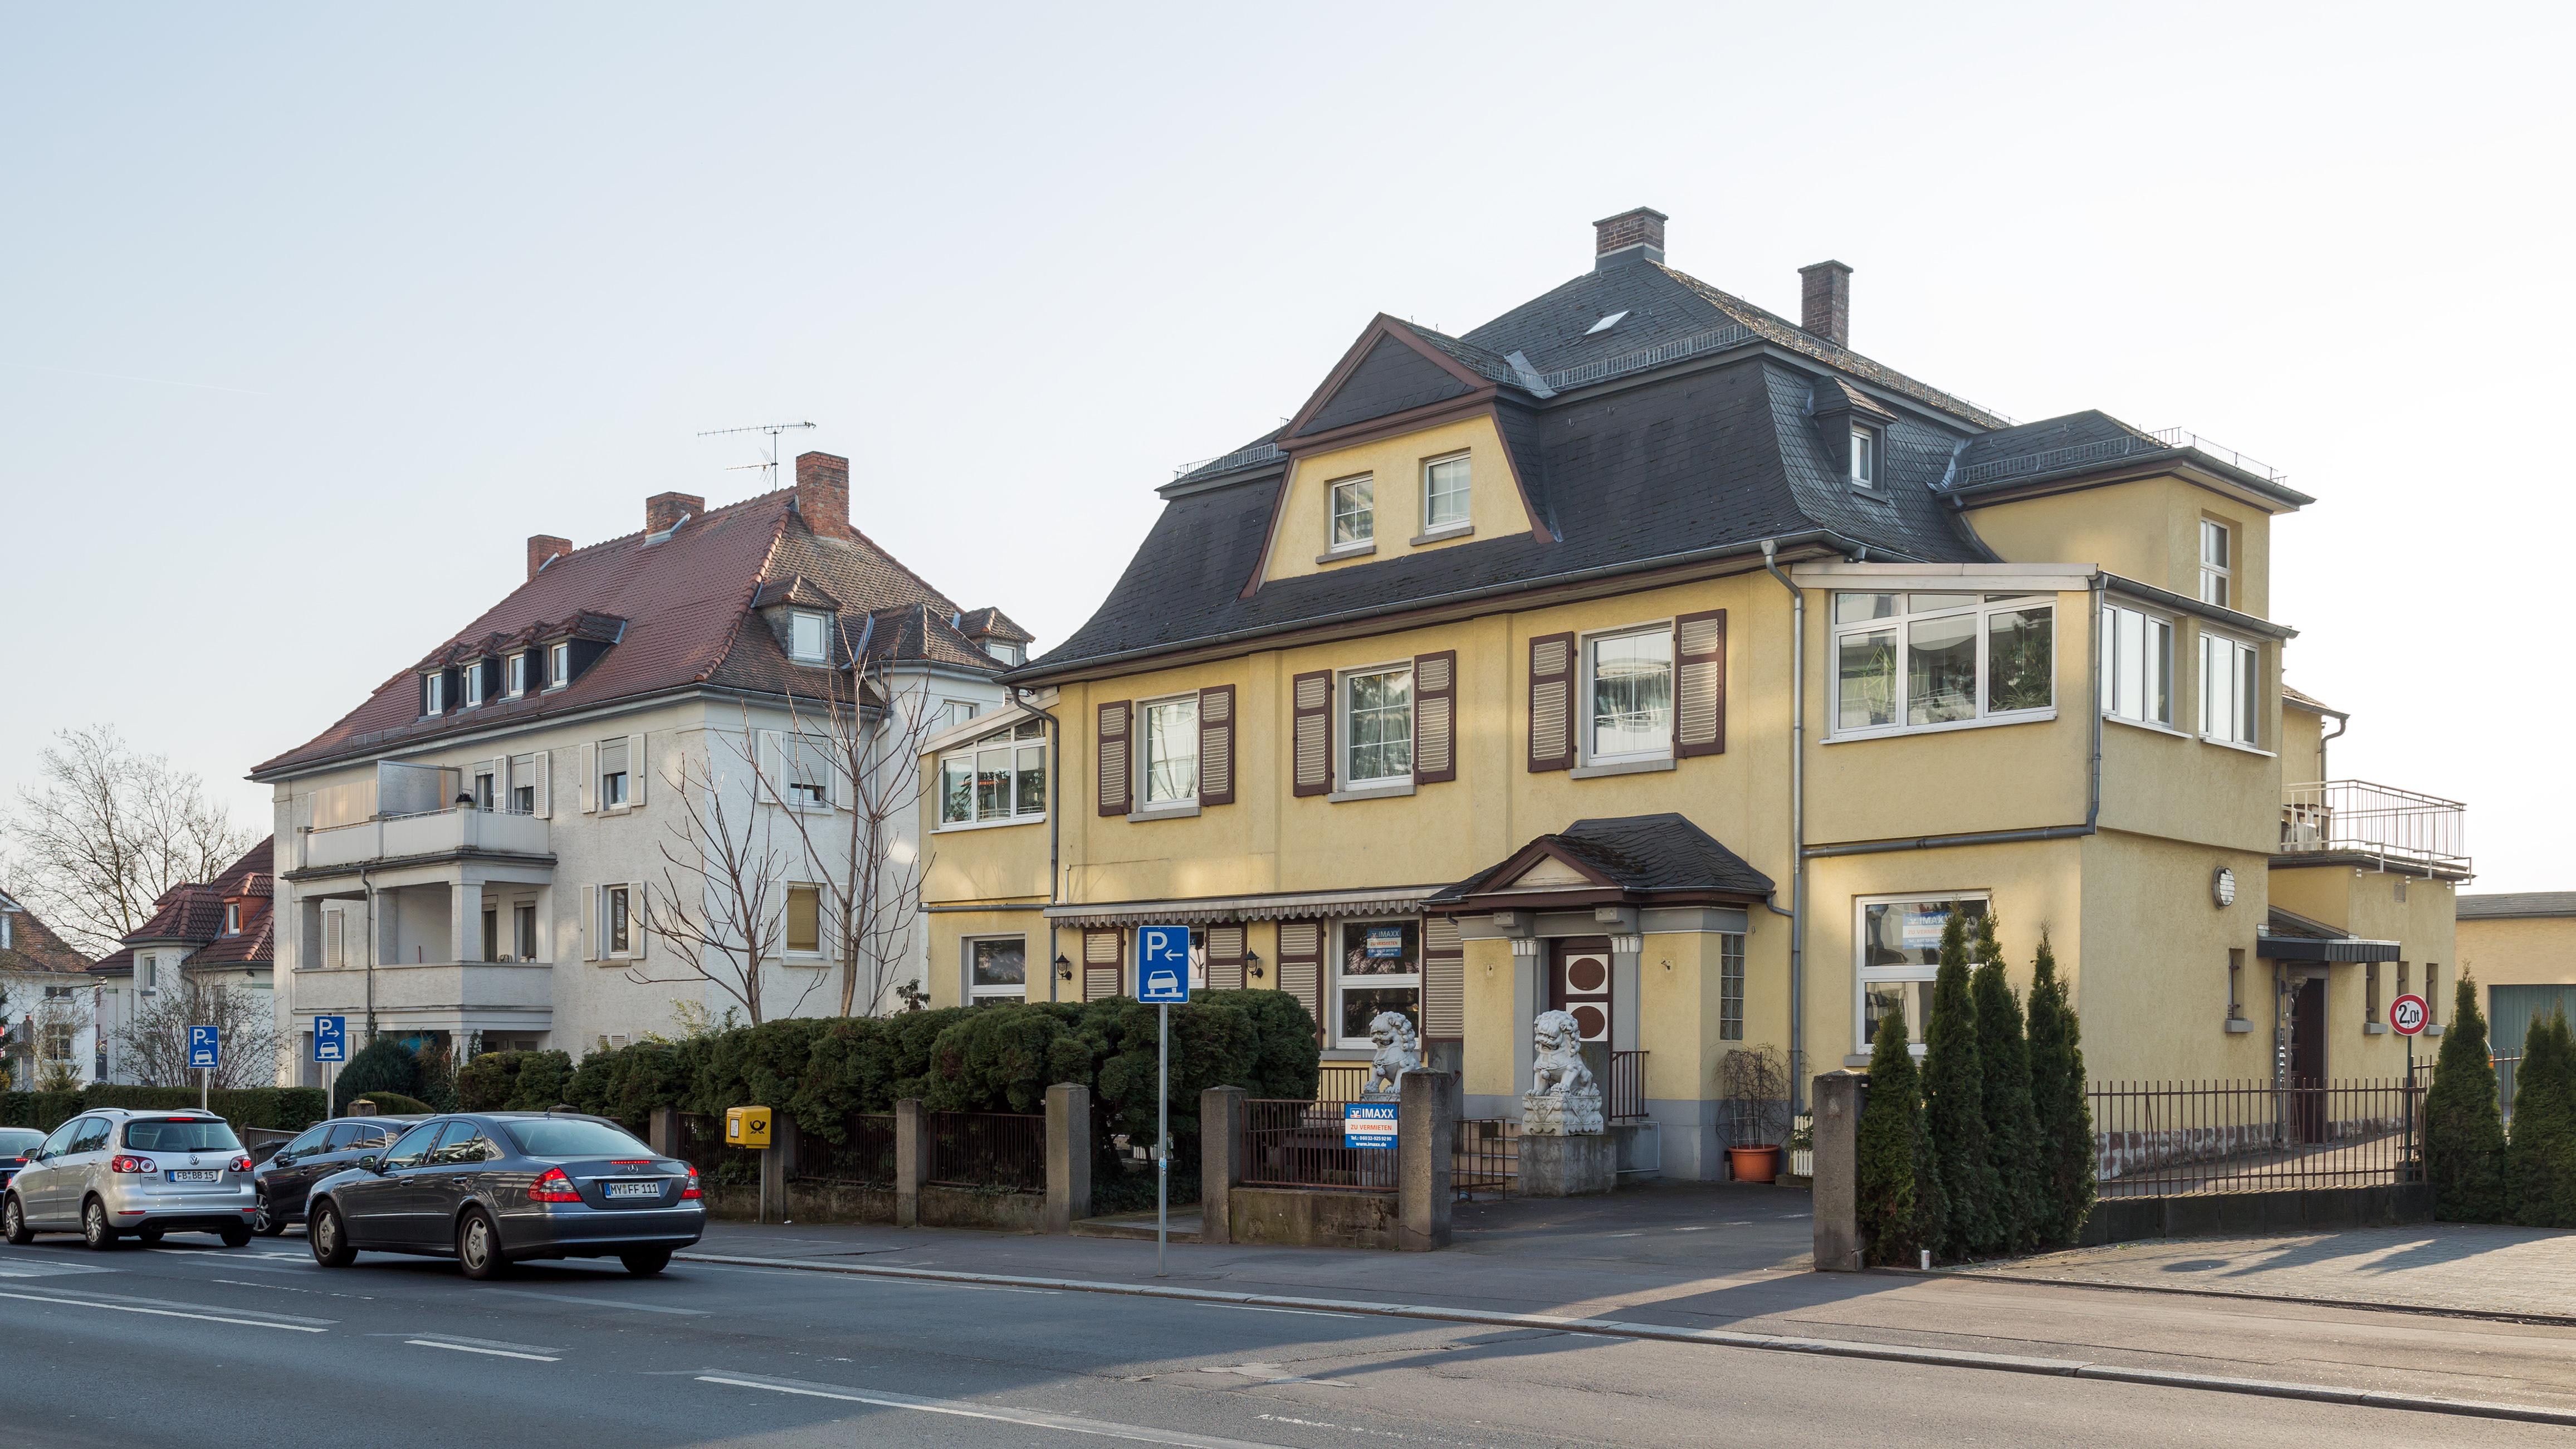 Frankfurter Bad file bad nauheim frankfurter strasse 2 6 nordosten 20140314 jpg